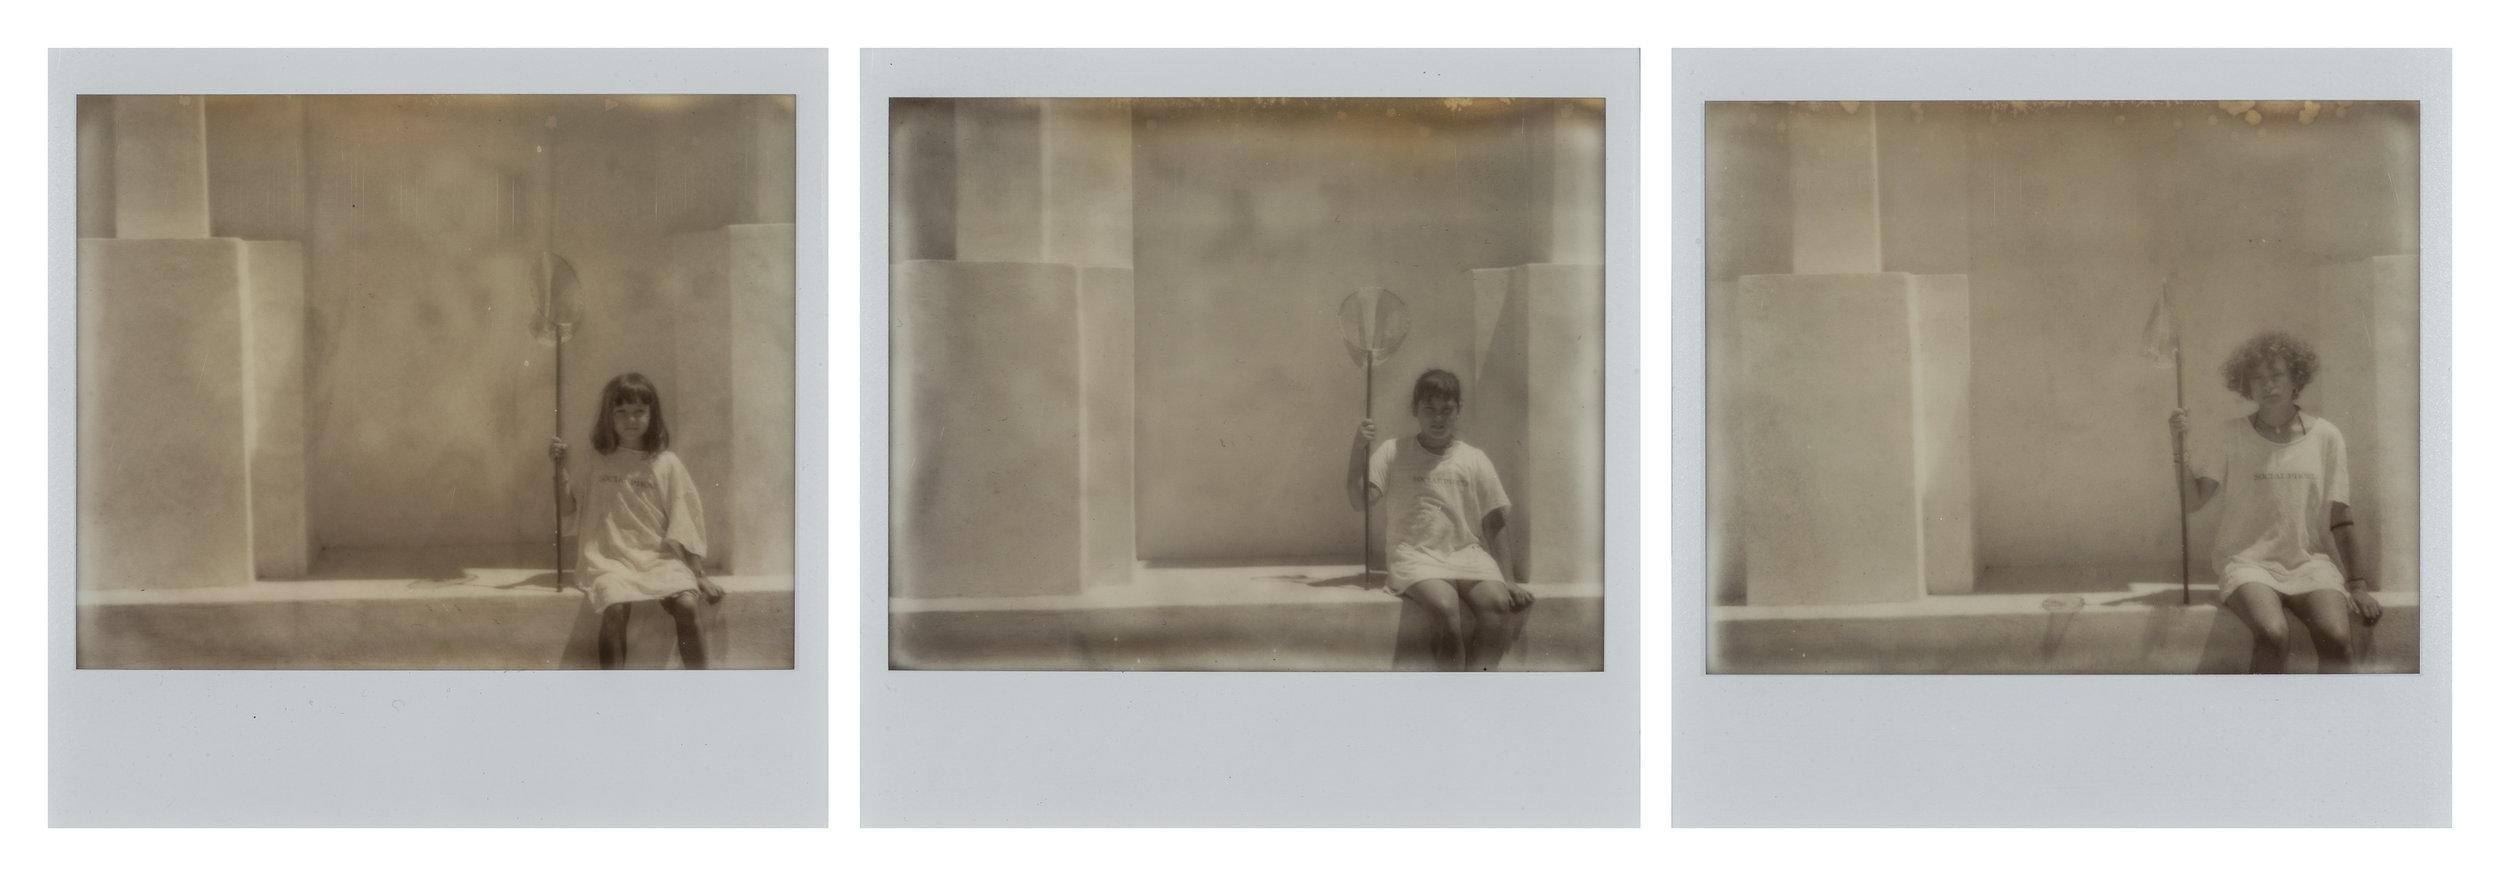 Simone Mussat Sartor,  Private memories # 12 , 2018, polaroid, 28 x 51 cm, courtesy:Alberto Peola Arte Contemporanea